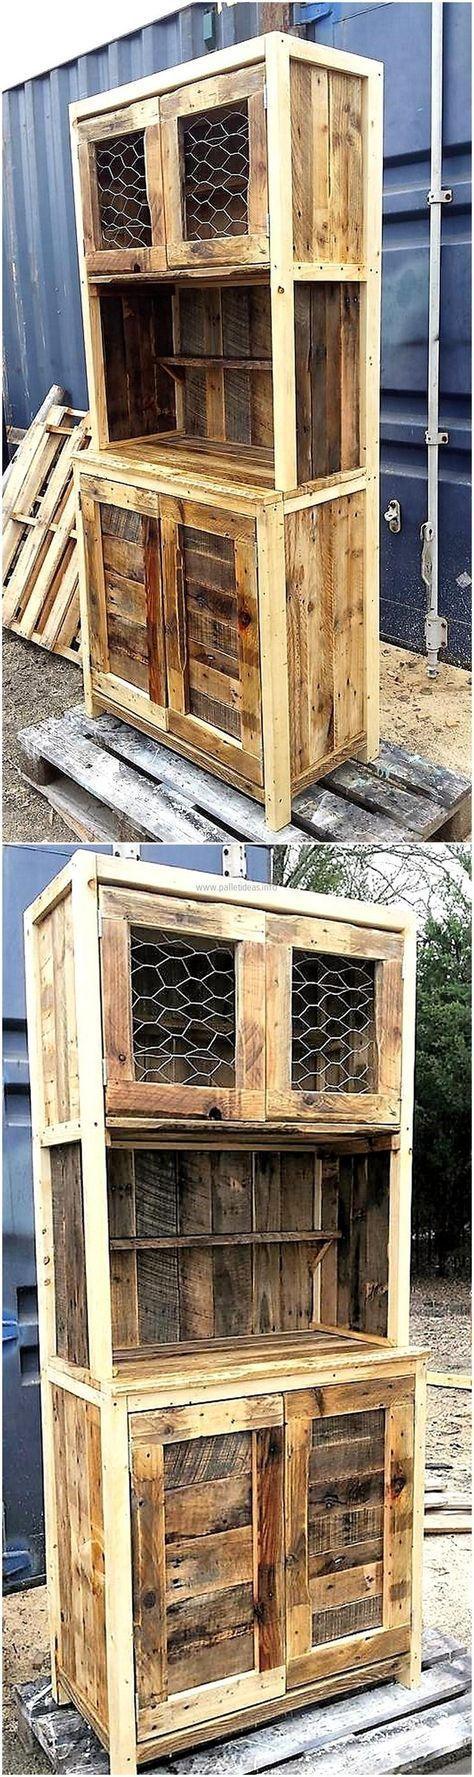 pallet rustic storage cabinet #refurbishedfurniture